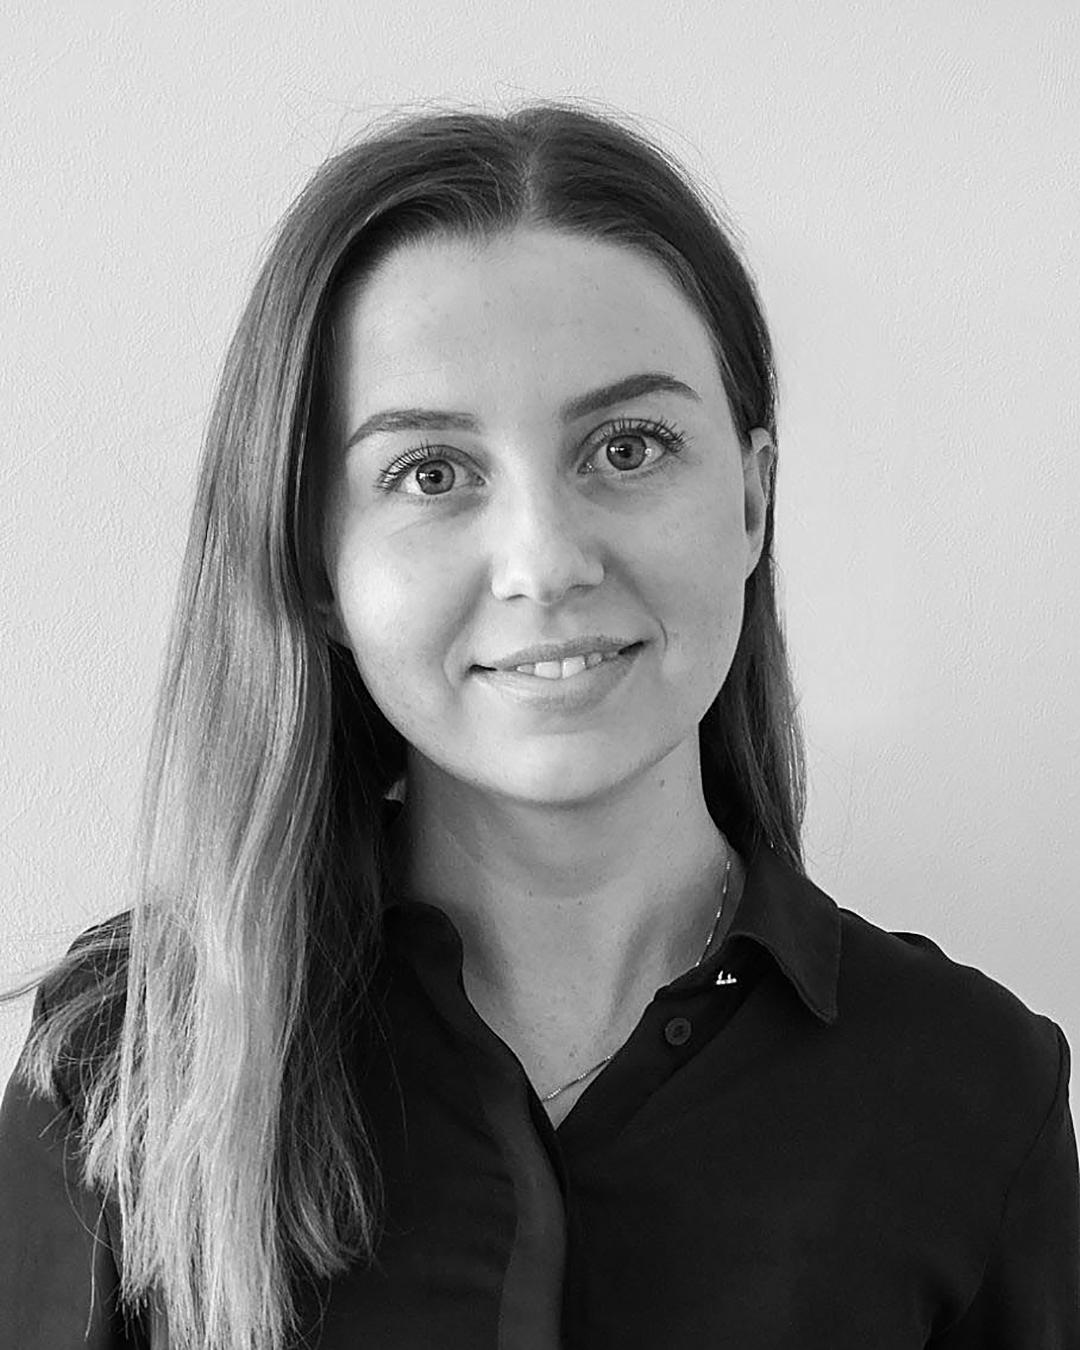 Julie Olsen